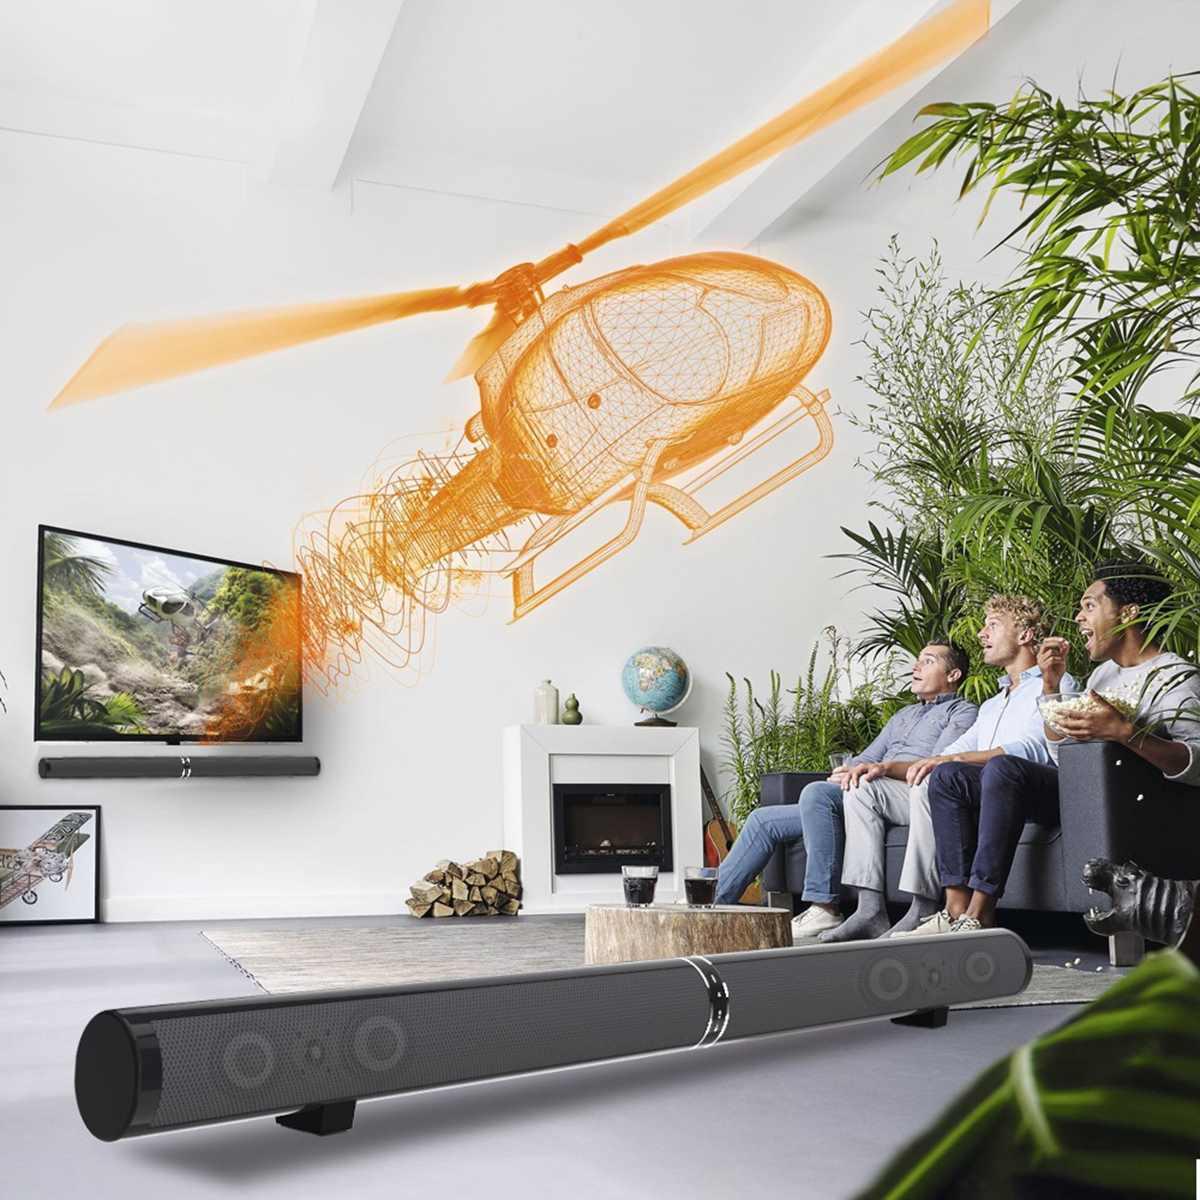 Detachable Wireless Soundbar Bluetooth Speaker Theater Subwoofer 3D Sound Bar Remote Control TV PC Phone